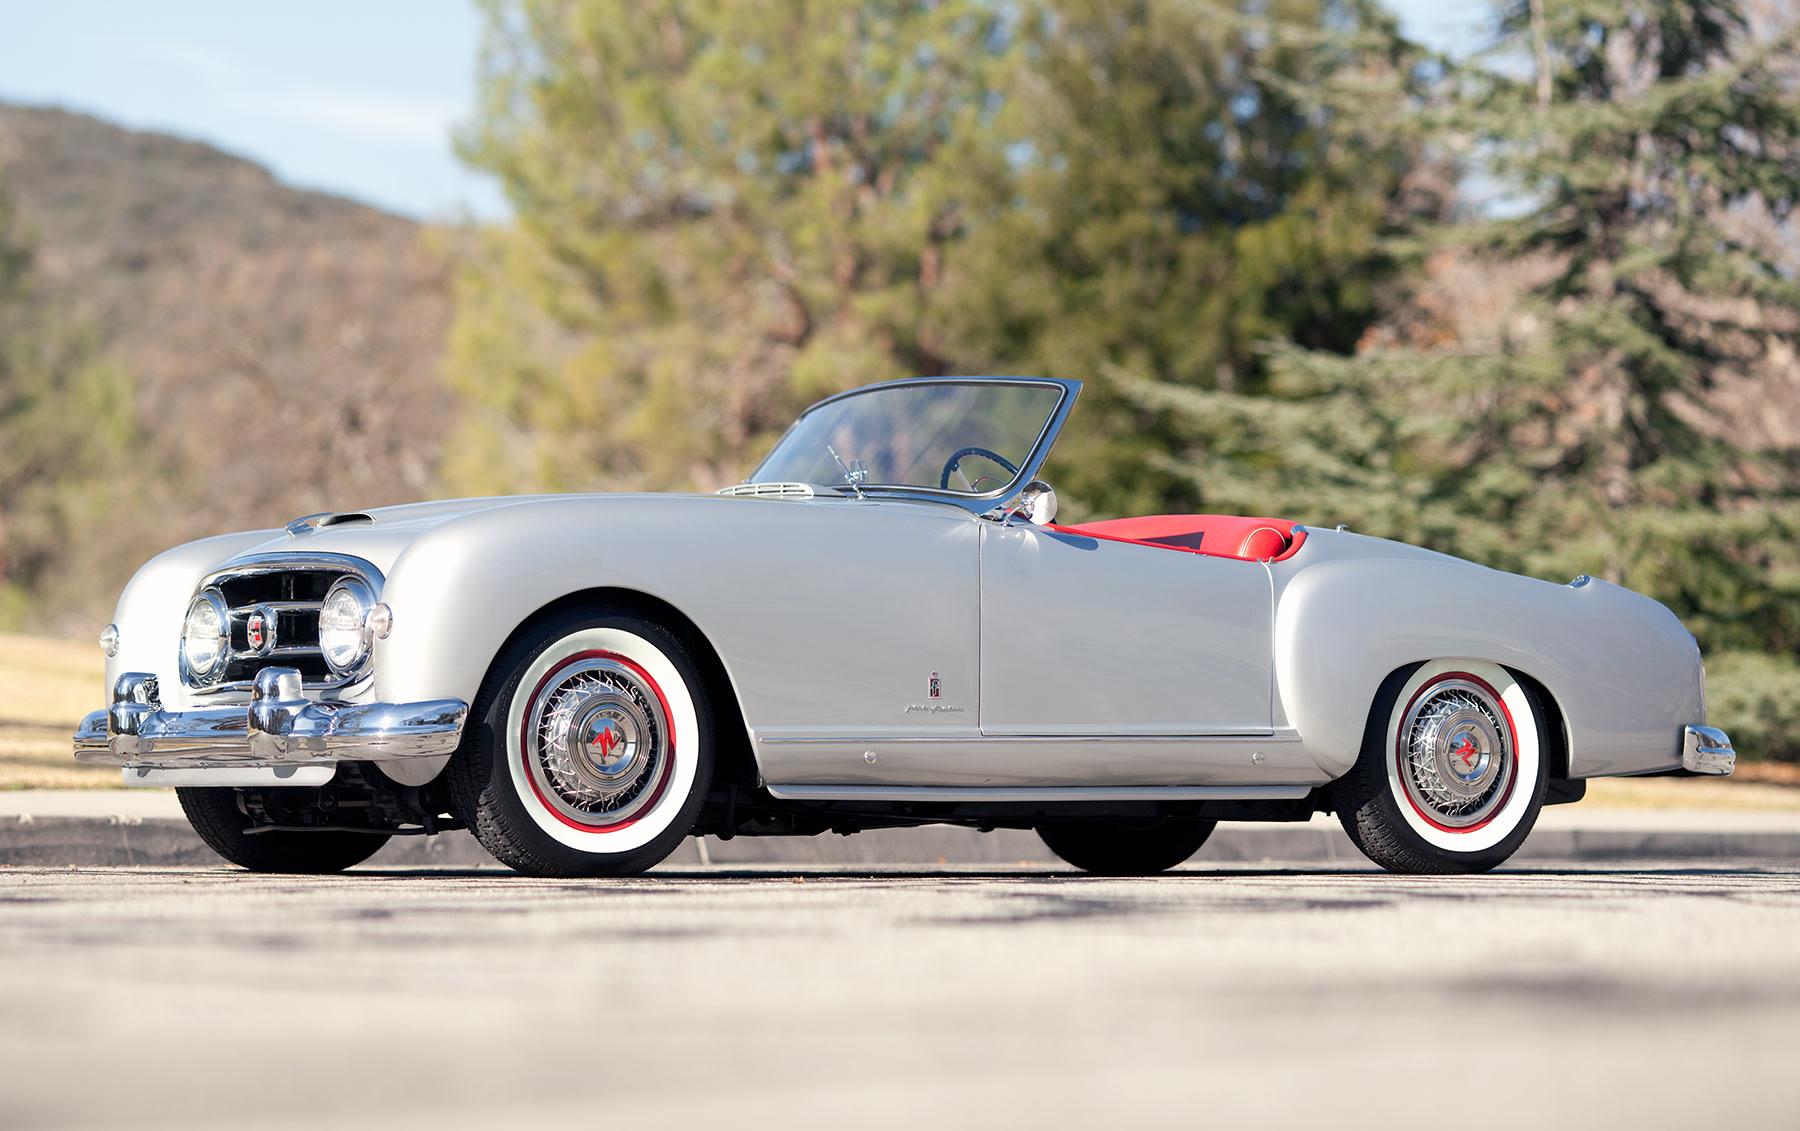 1953 Nash-Healey Roadster